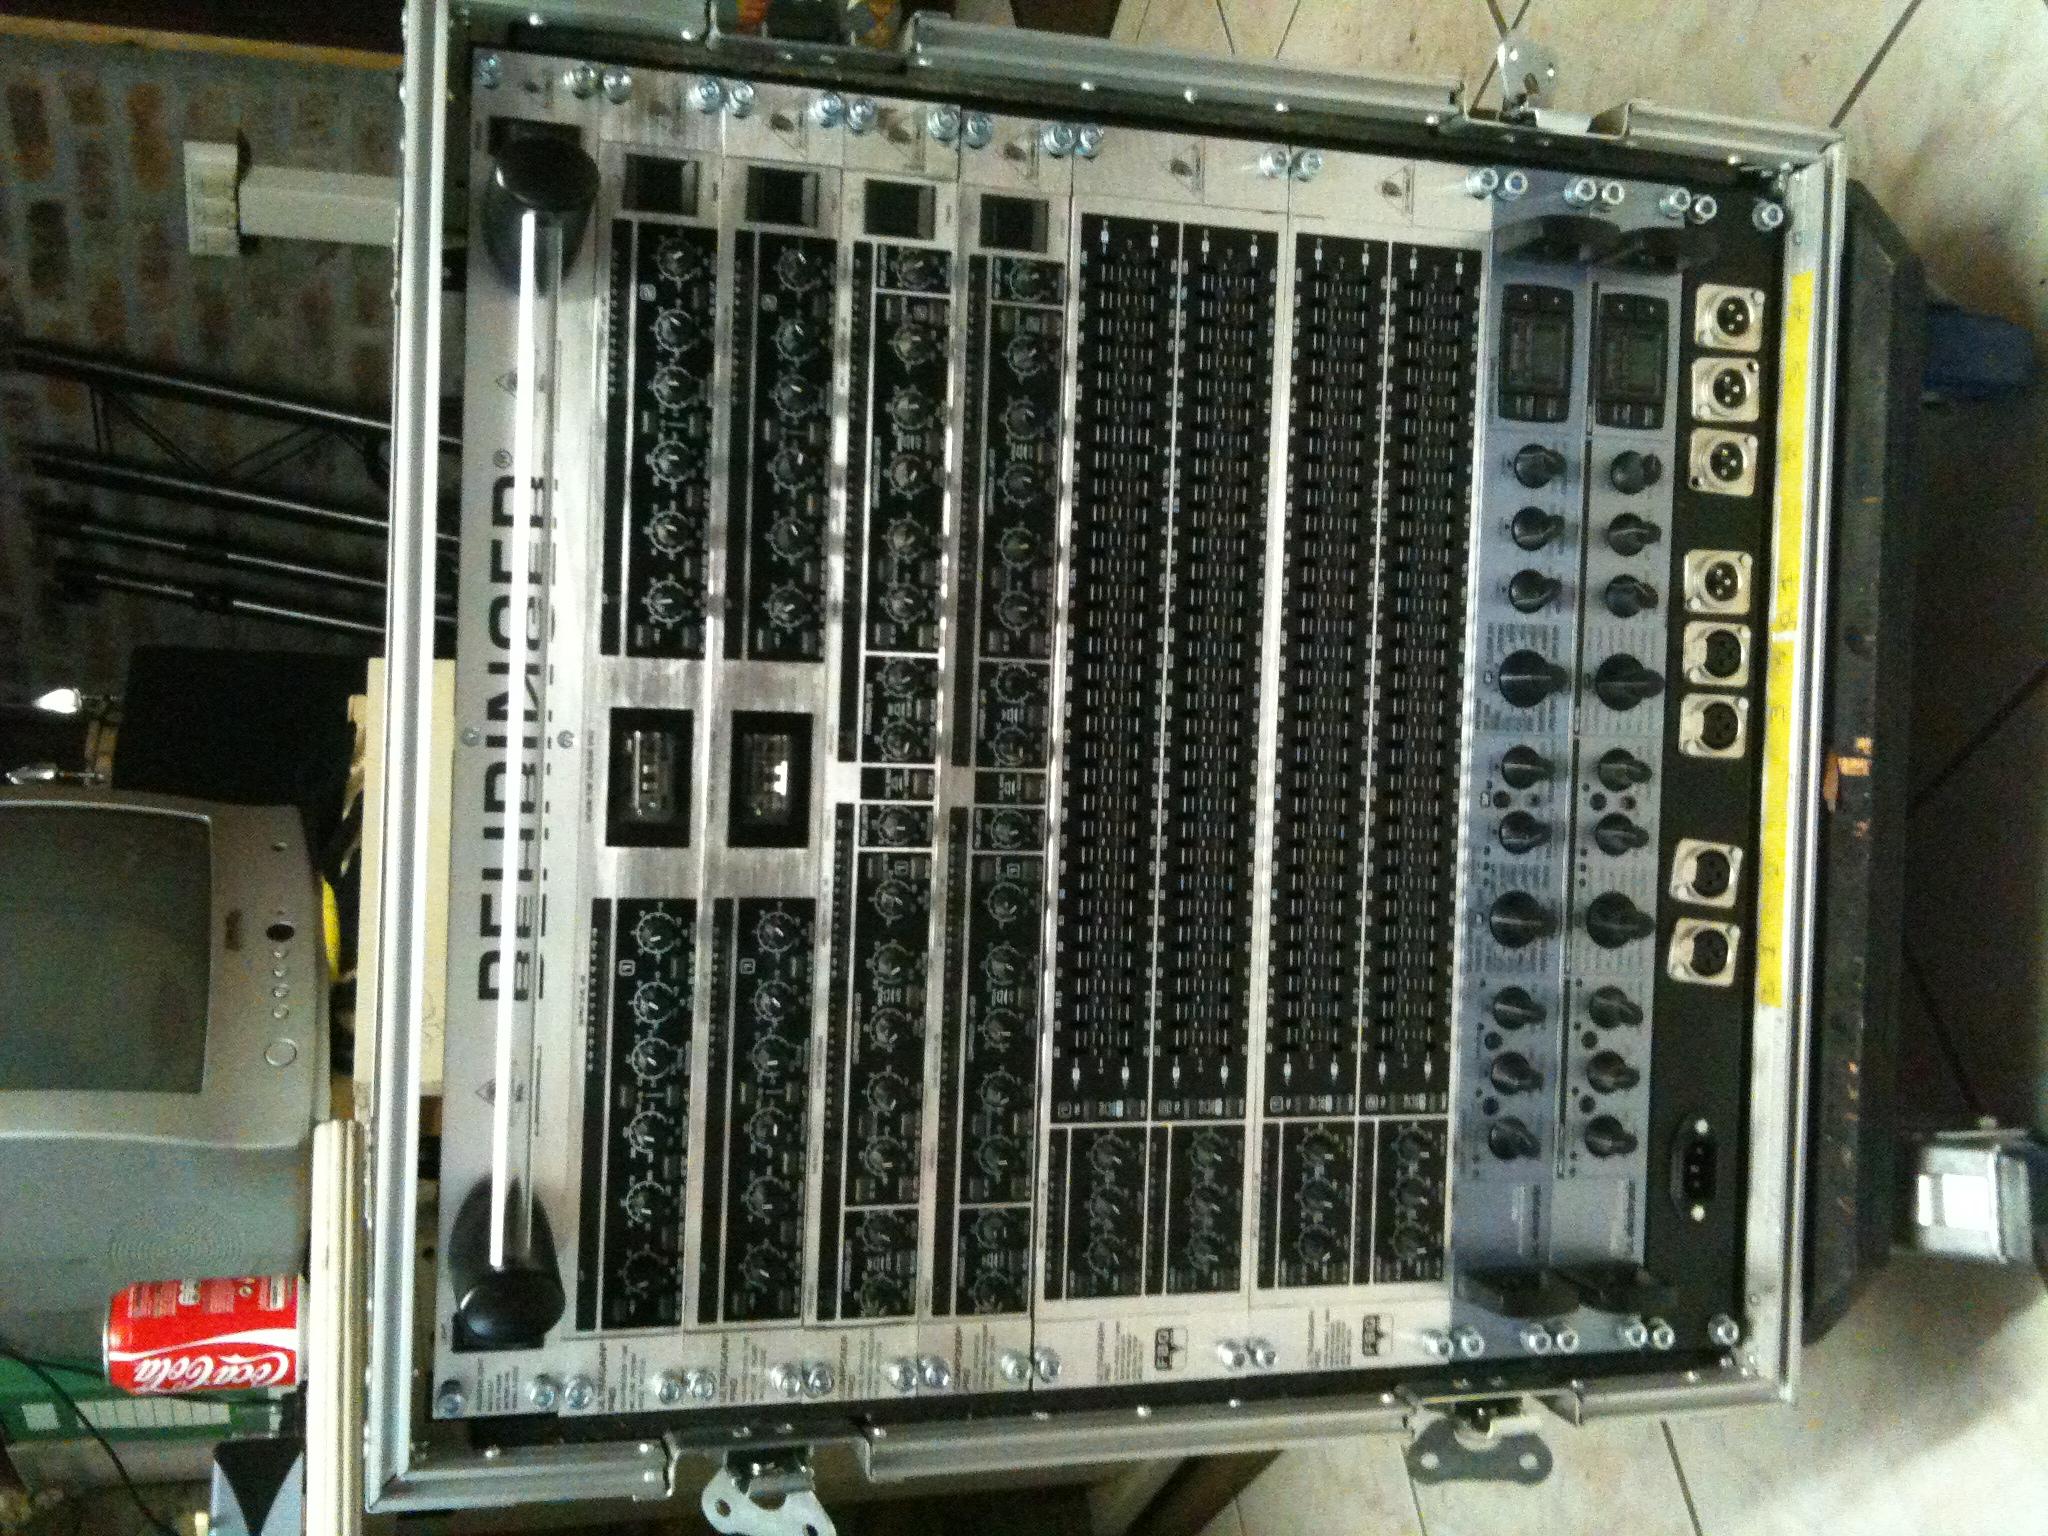 Behringer Autocom Mdx1200 Image 285769 Audiofanzine